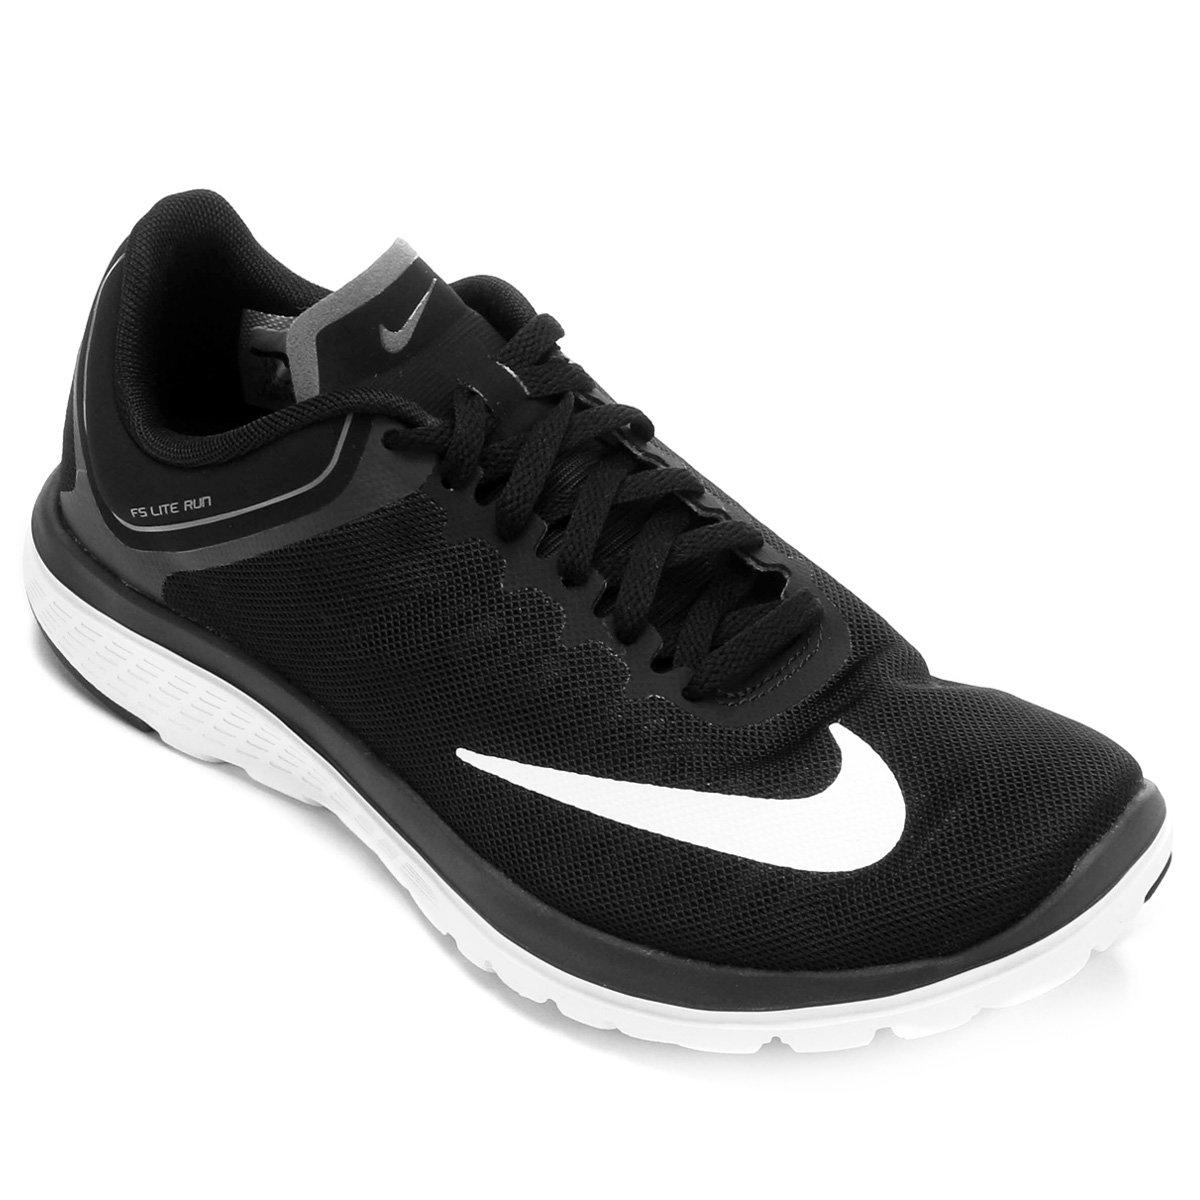 c41c2f619e4b3 Tênis Nike Fs Lite Run 4 Feminino